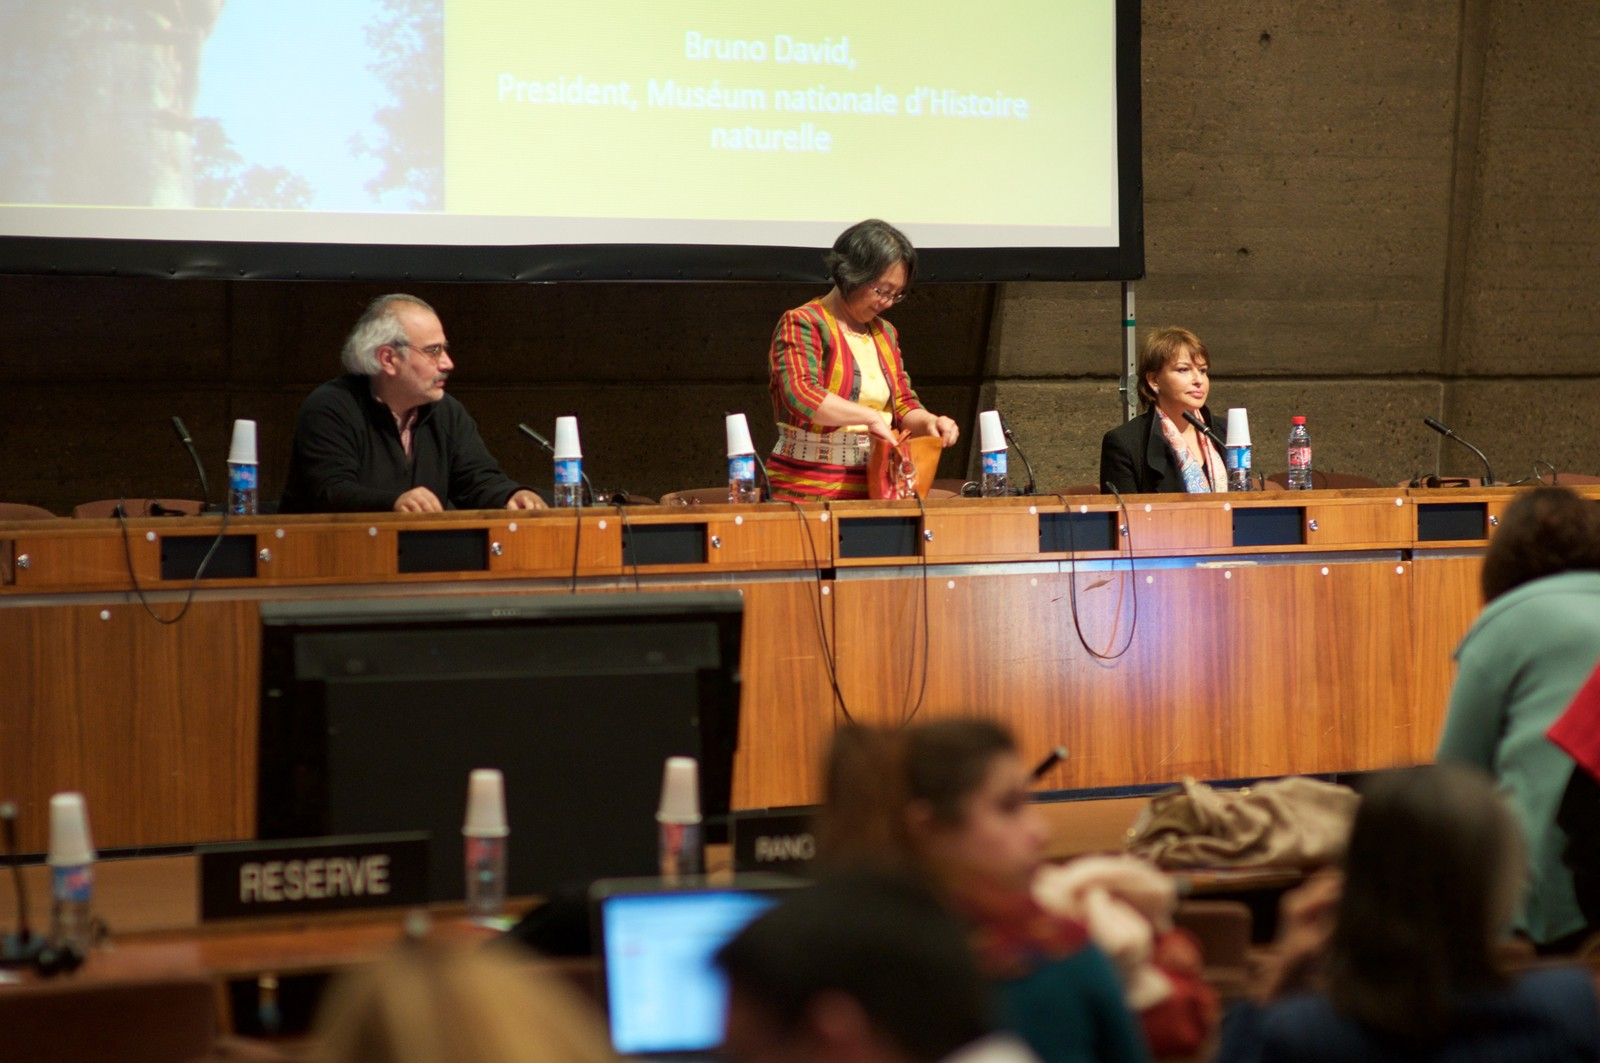 Fra UNESCOs urfolkskonferanse Resilience in a time of uncertainty. FNs spesialrapportør for urfolksrettigheter, Victoria Tauli-Corpuz på podiet.